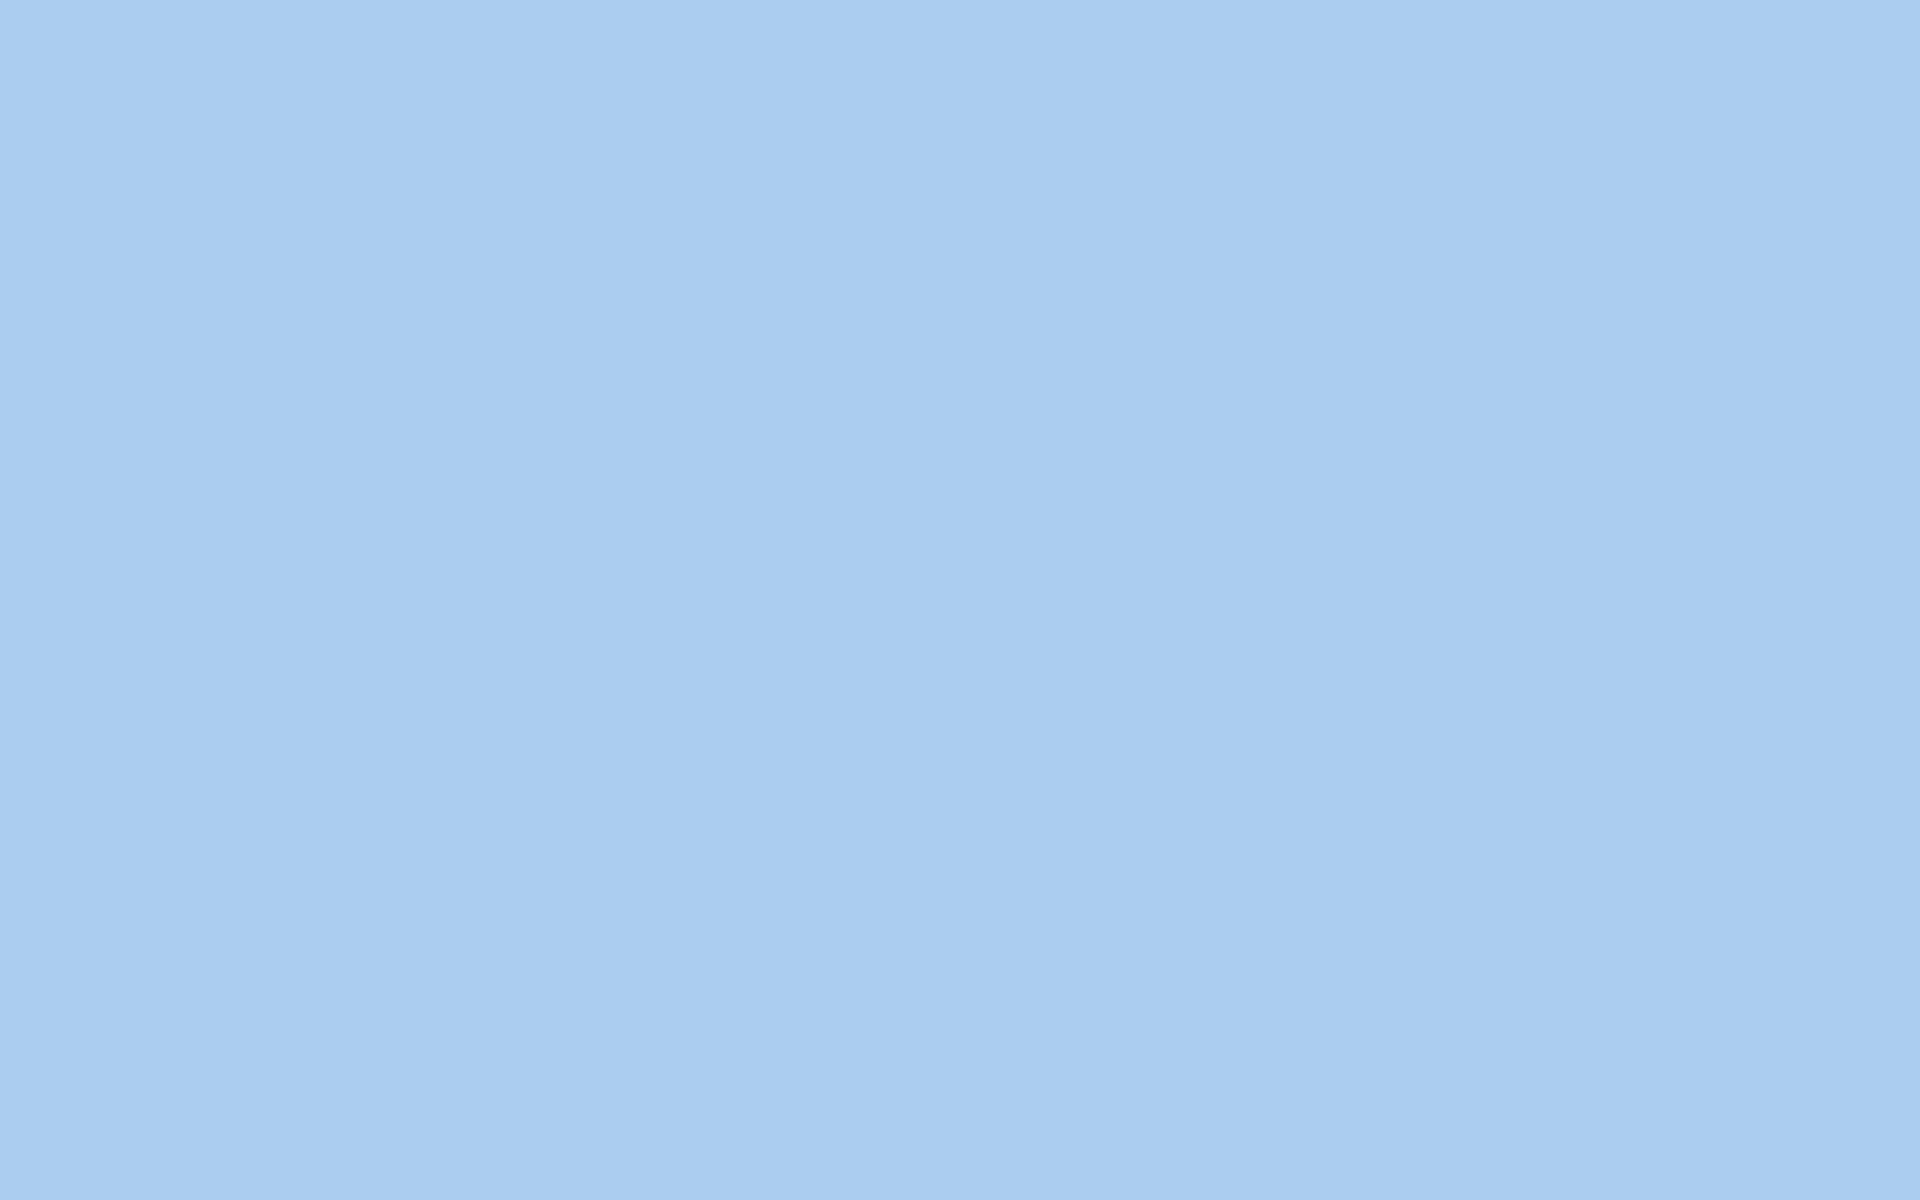 1920x1200 Pale Cornflower Blue Solid Color Background